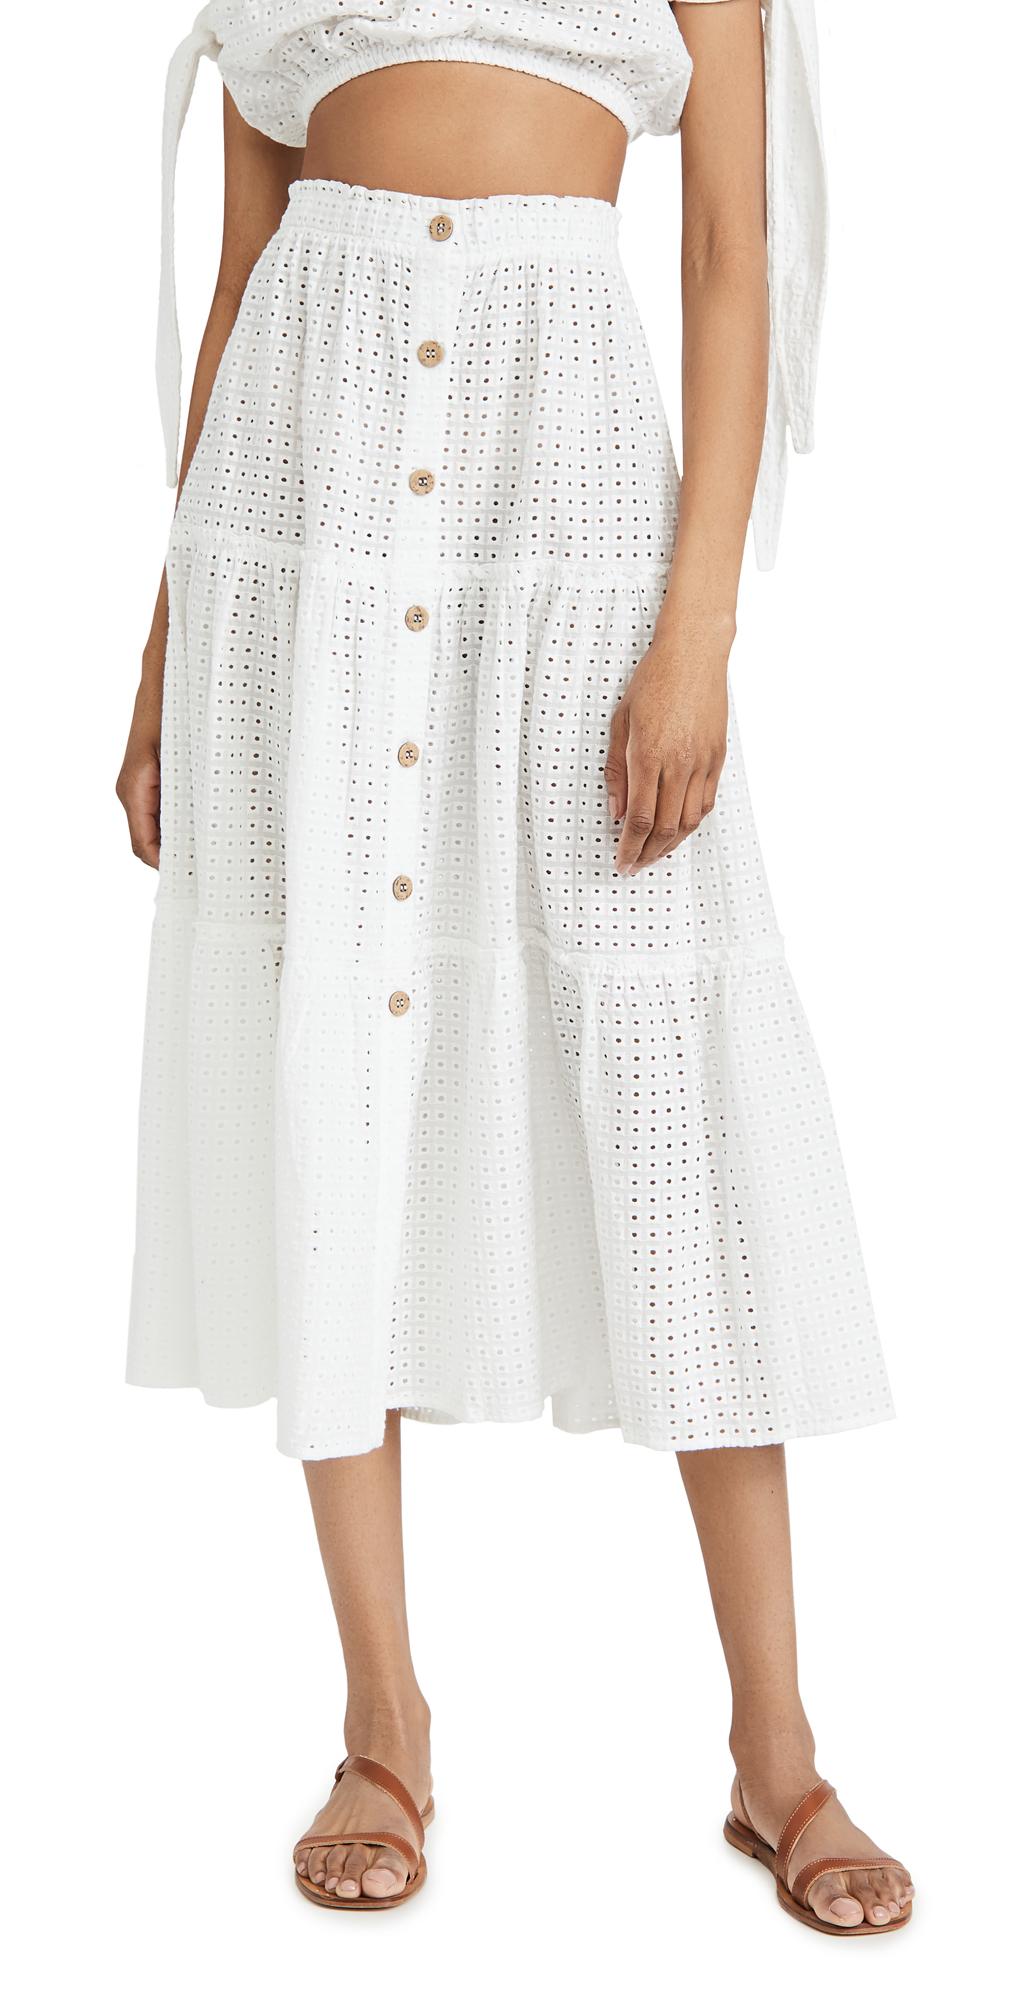 Eberjey Portola Nolita Cover Up Skirt